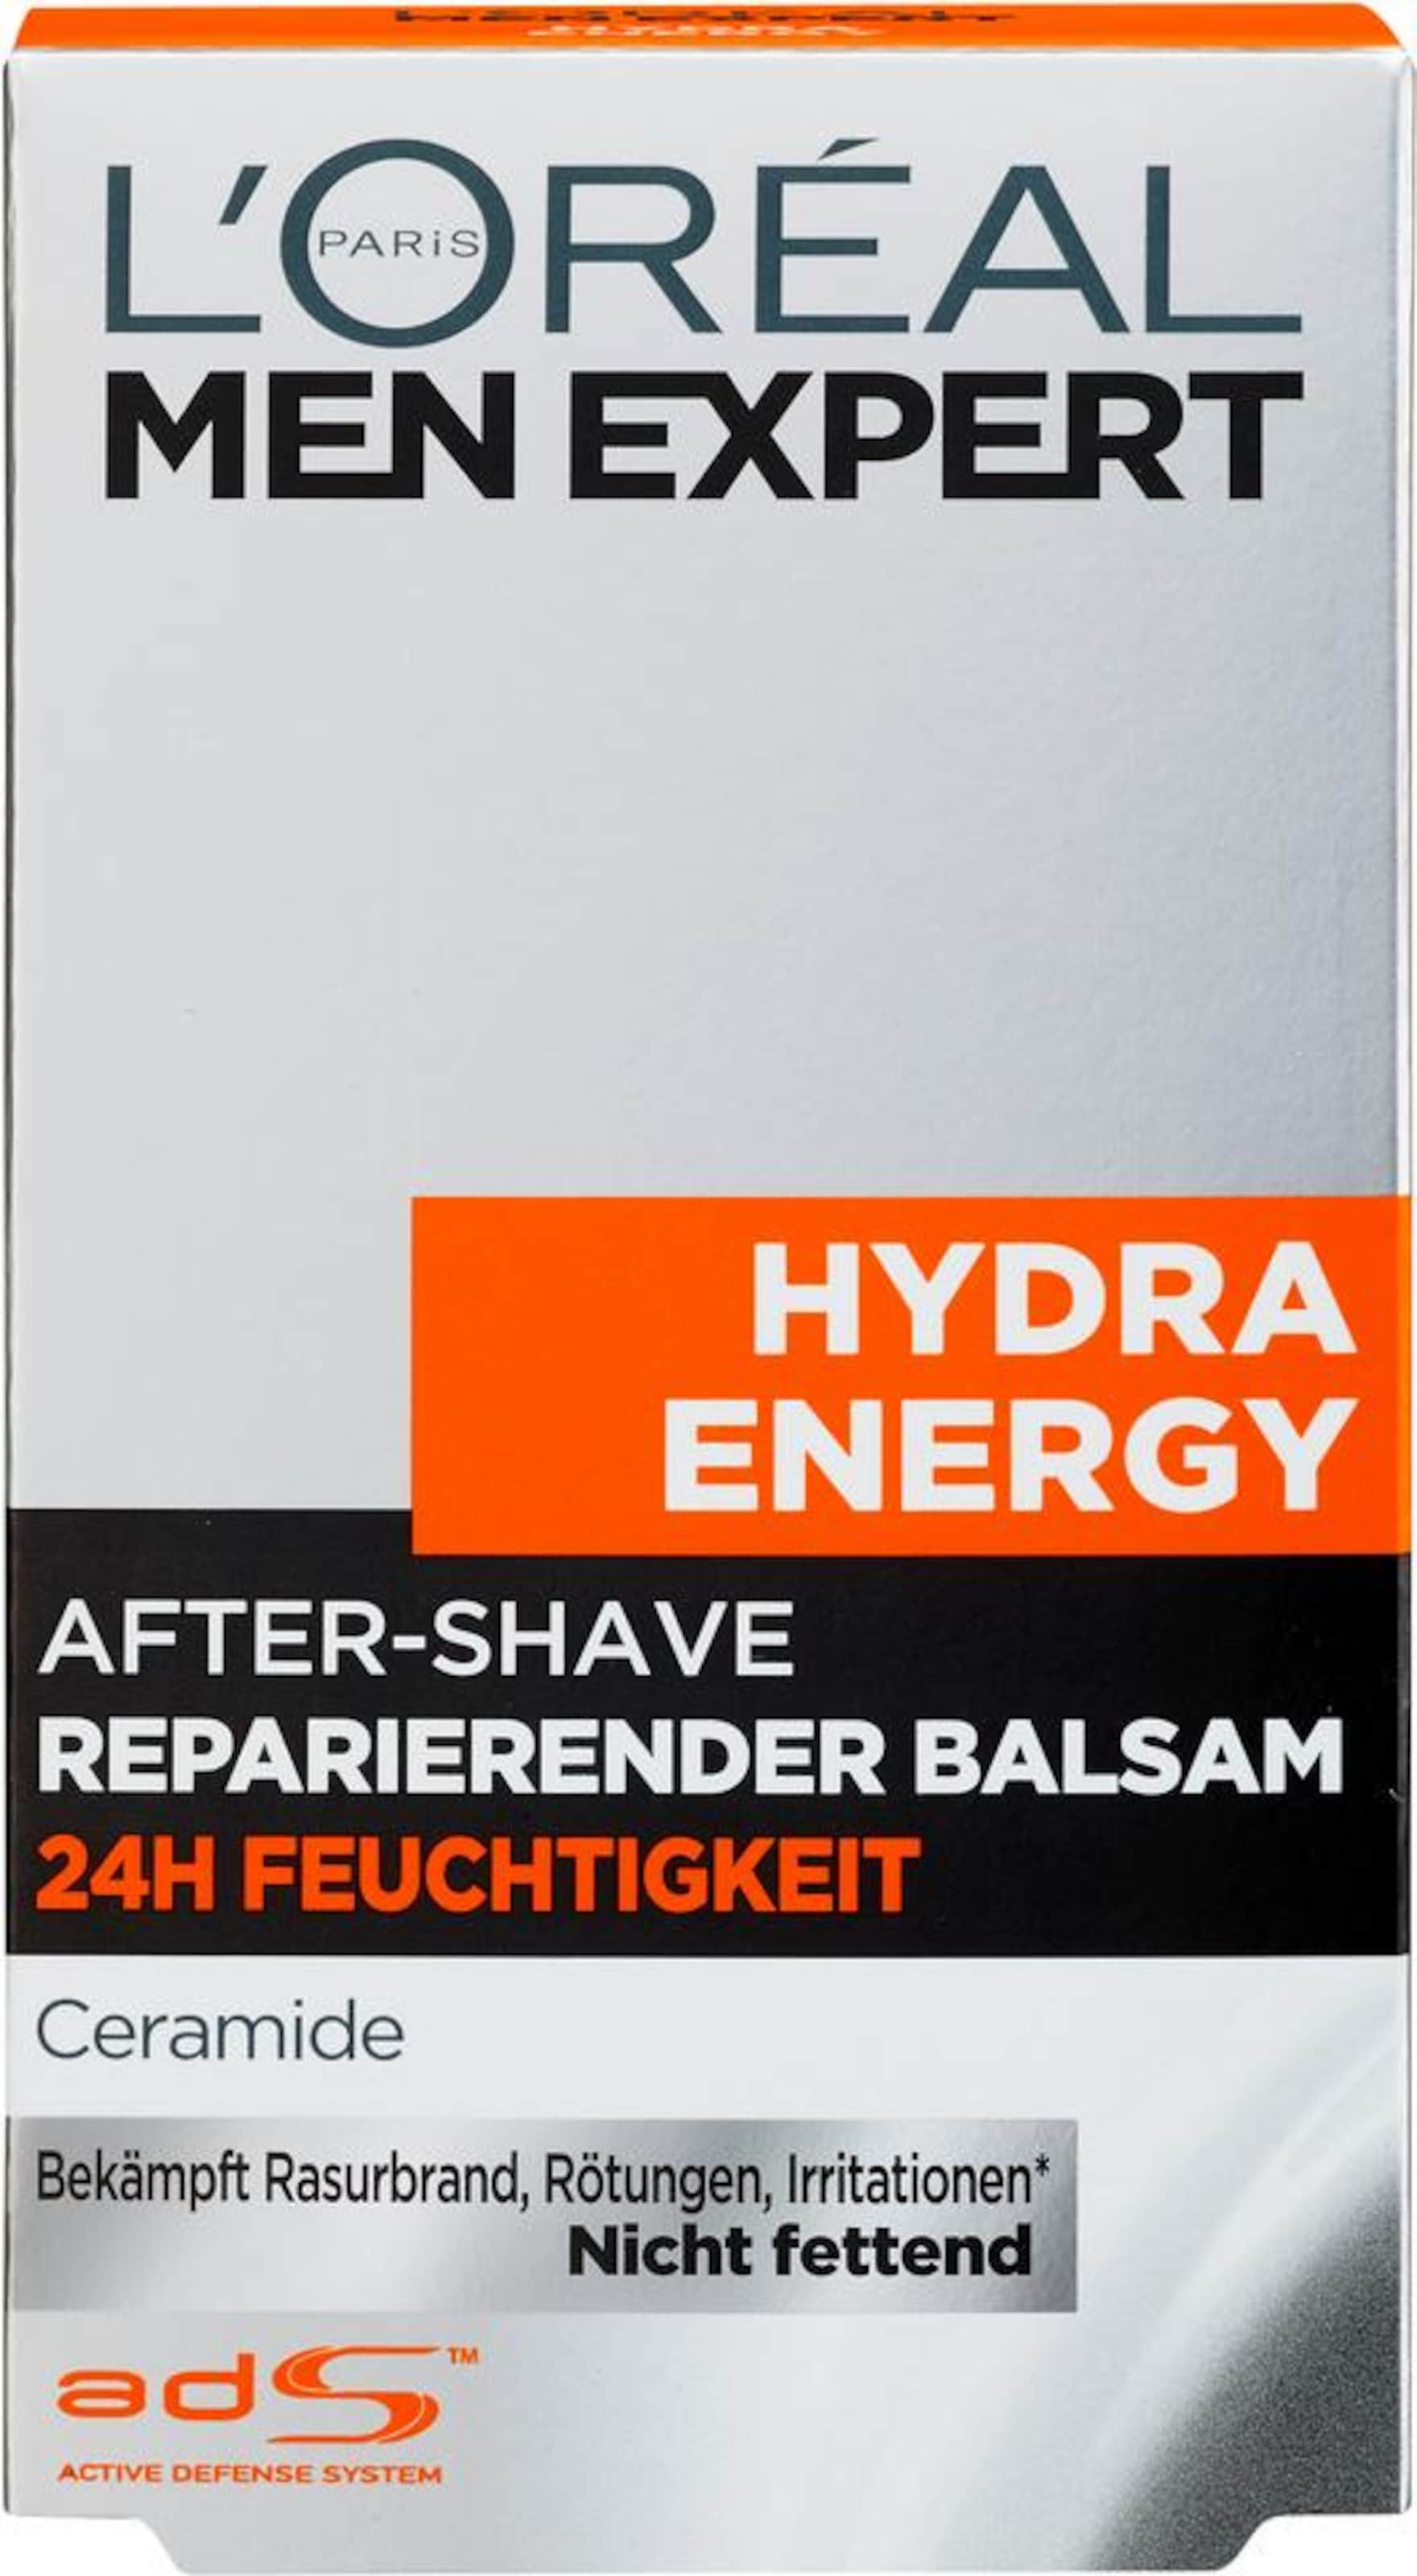 L'oréal Expert Paris Men After Energy' Shave Balsam In Weiß 'hydra hQdCstr